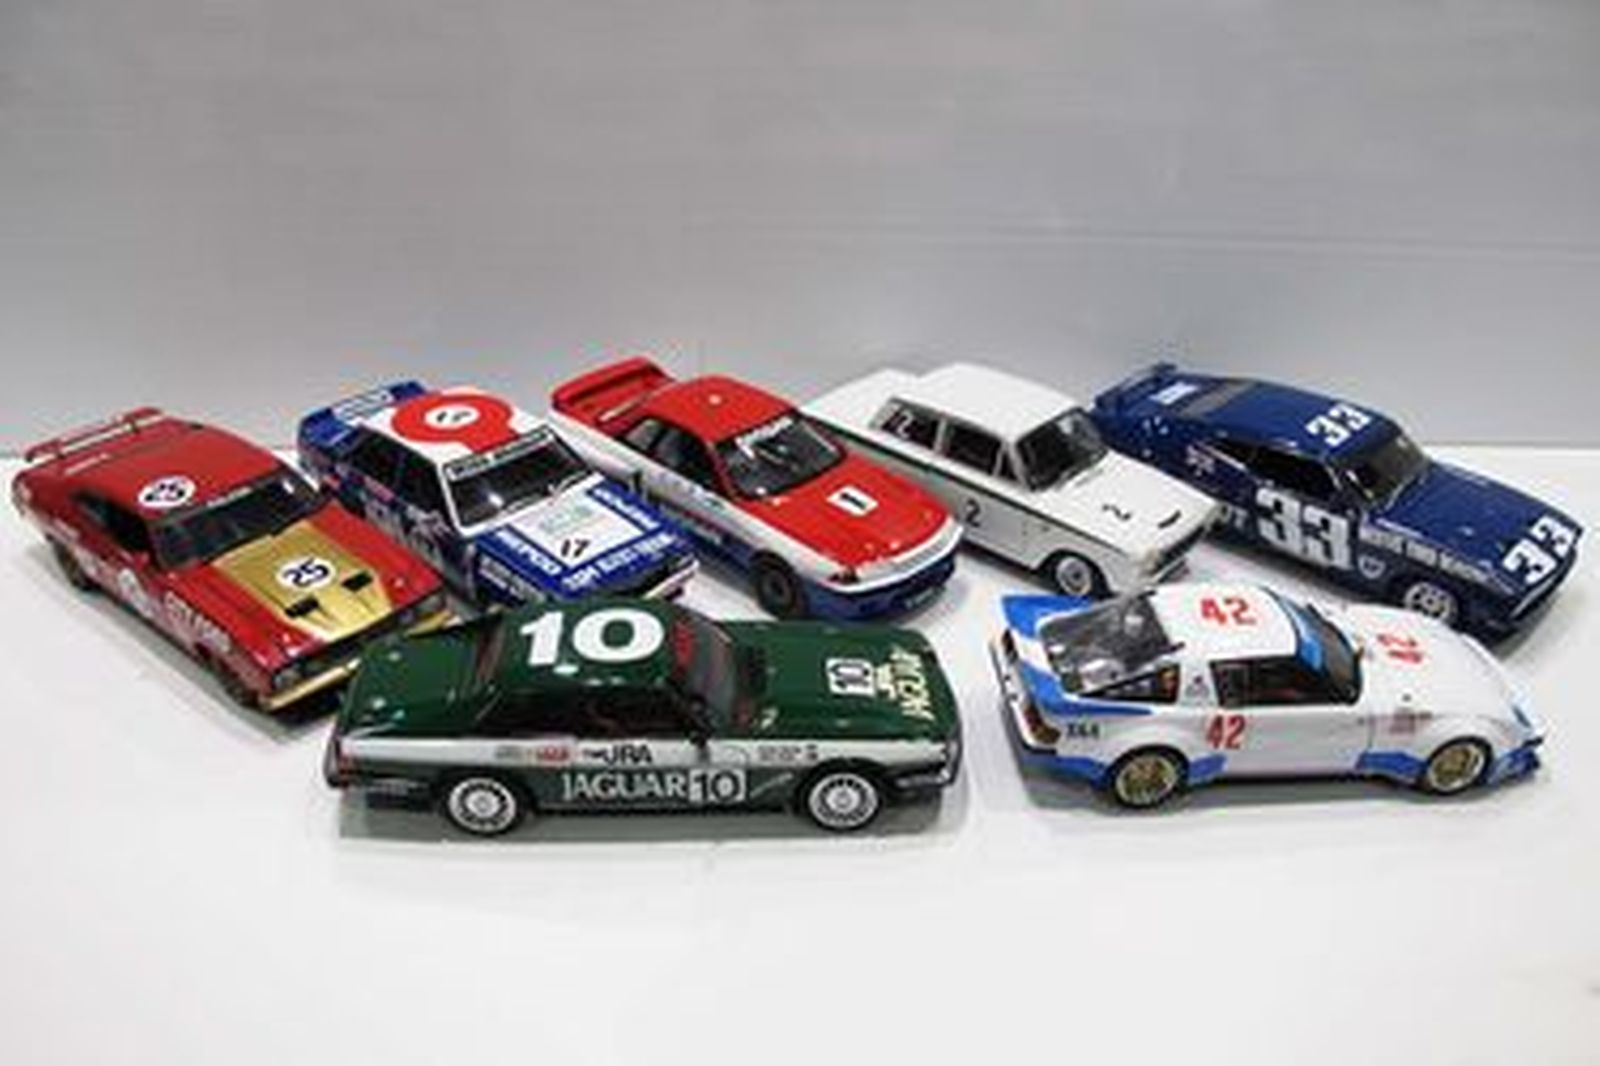 Model Cars x 7 - AutoArt & Biante: Group C & Touring Cars (Scale 1:18)